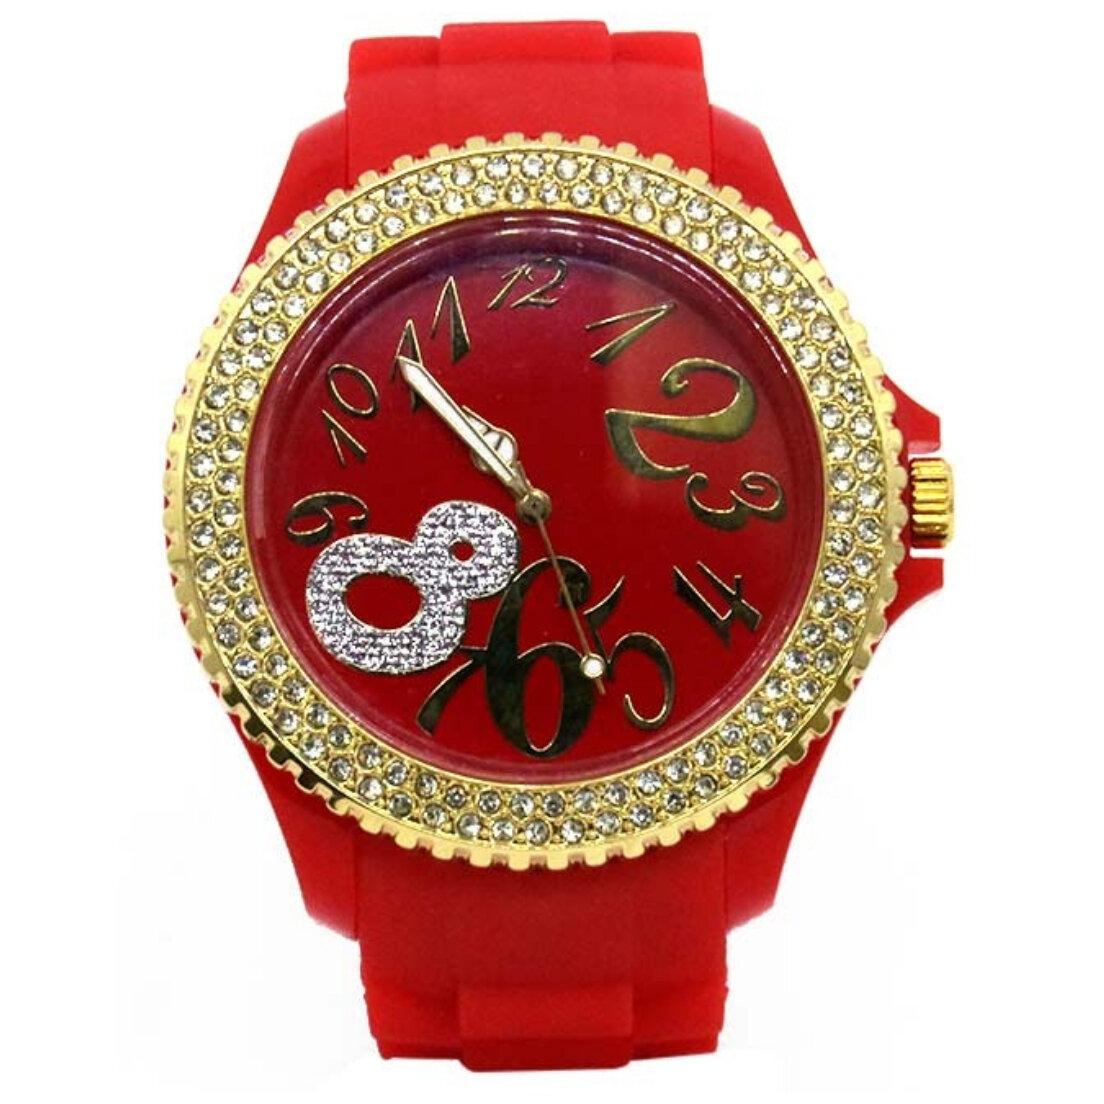 Relógio Khatto Red Fashion Feminino - Vermelho